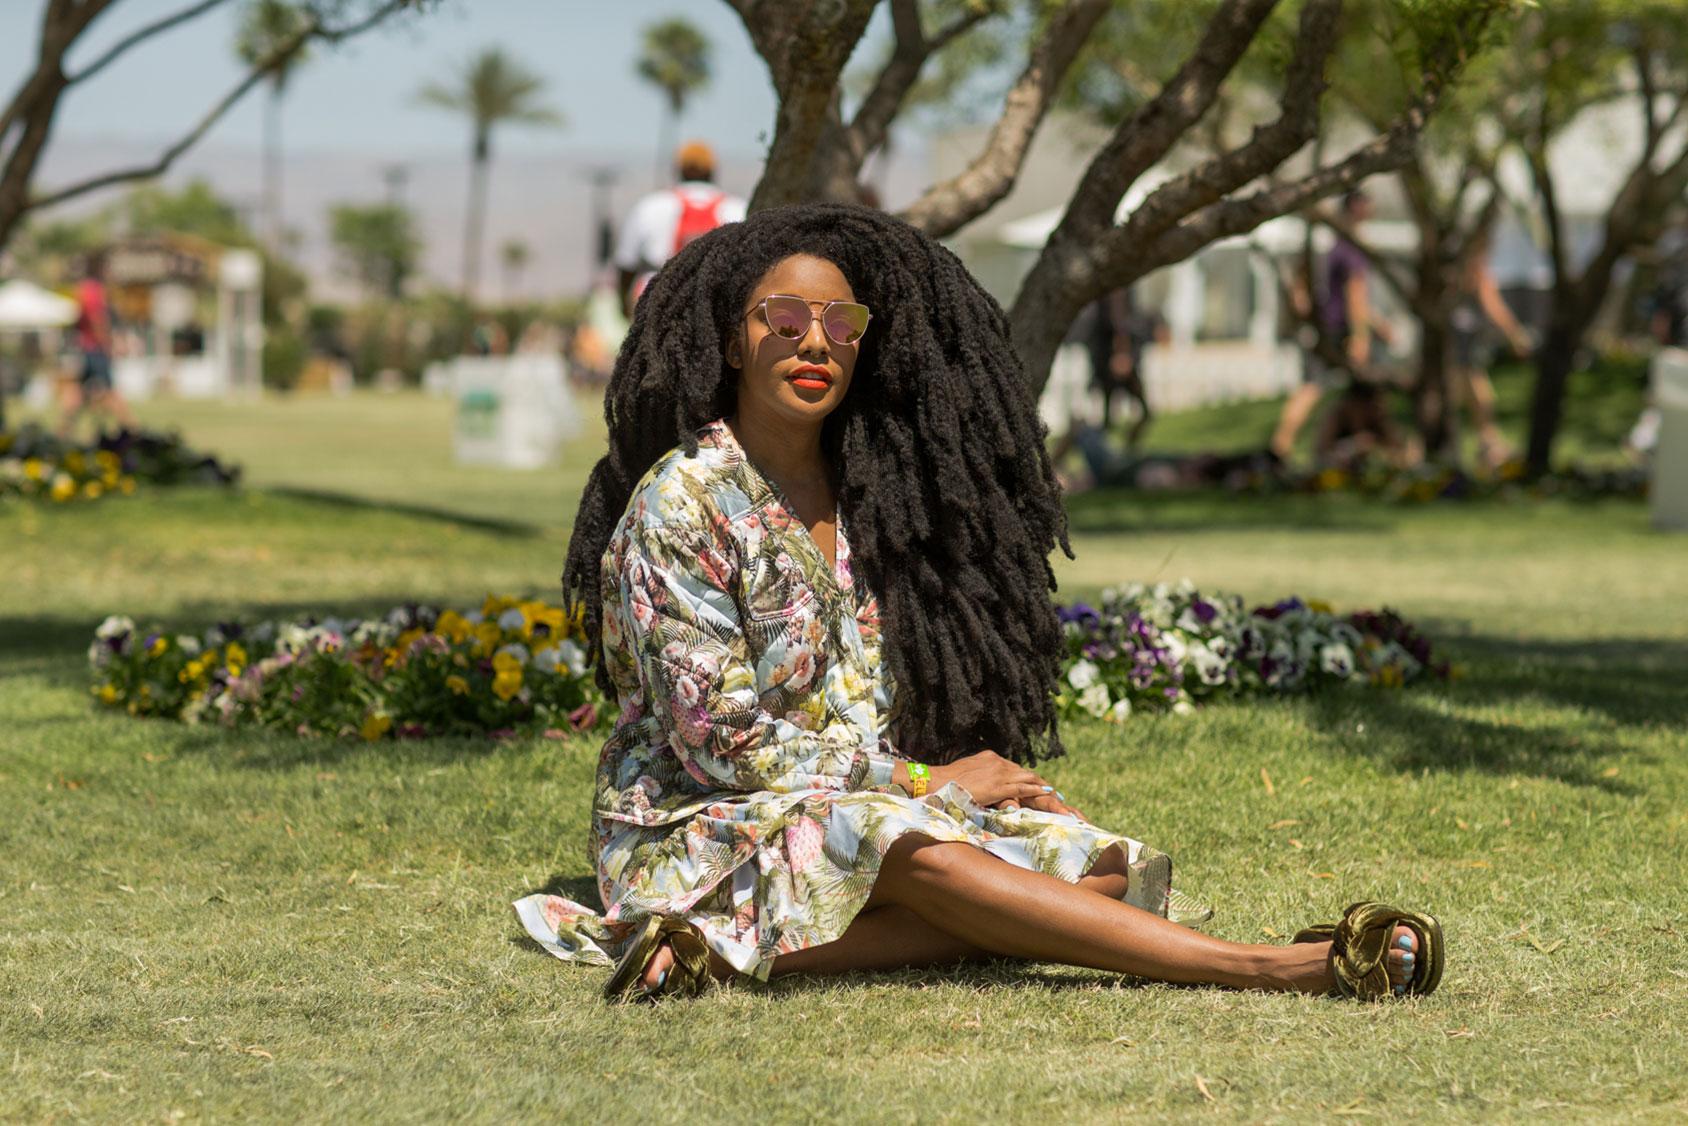 TK身着H&M春夏系列的花卉系列套装,搭配柔软的天鹅绒平底鞋与太阳眼镜。